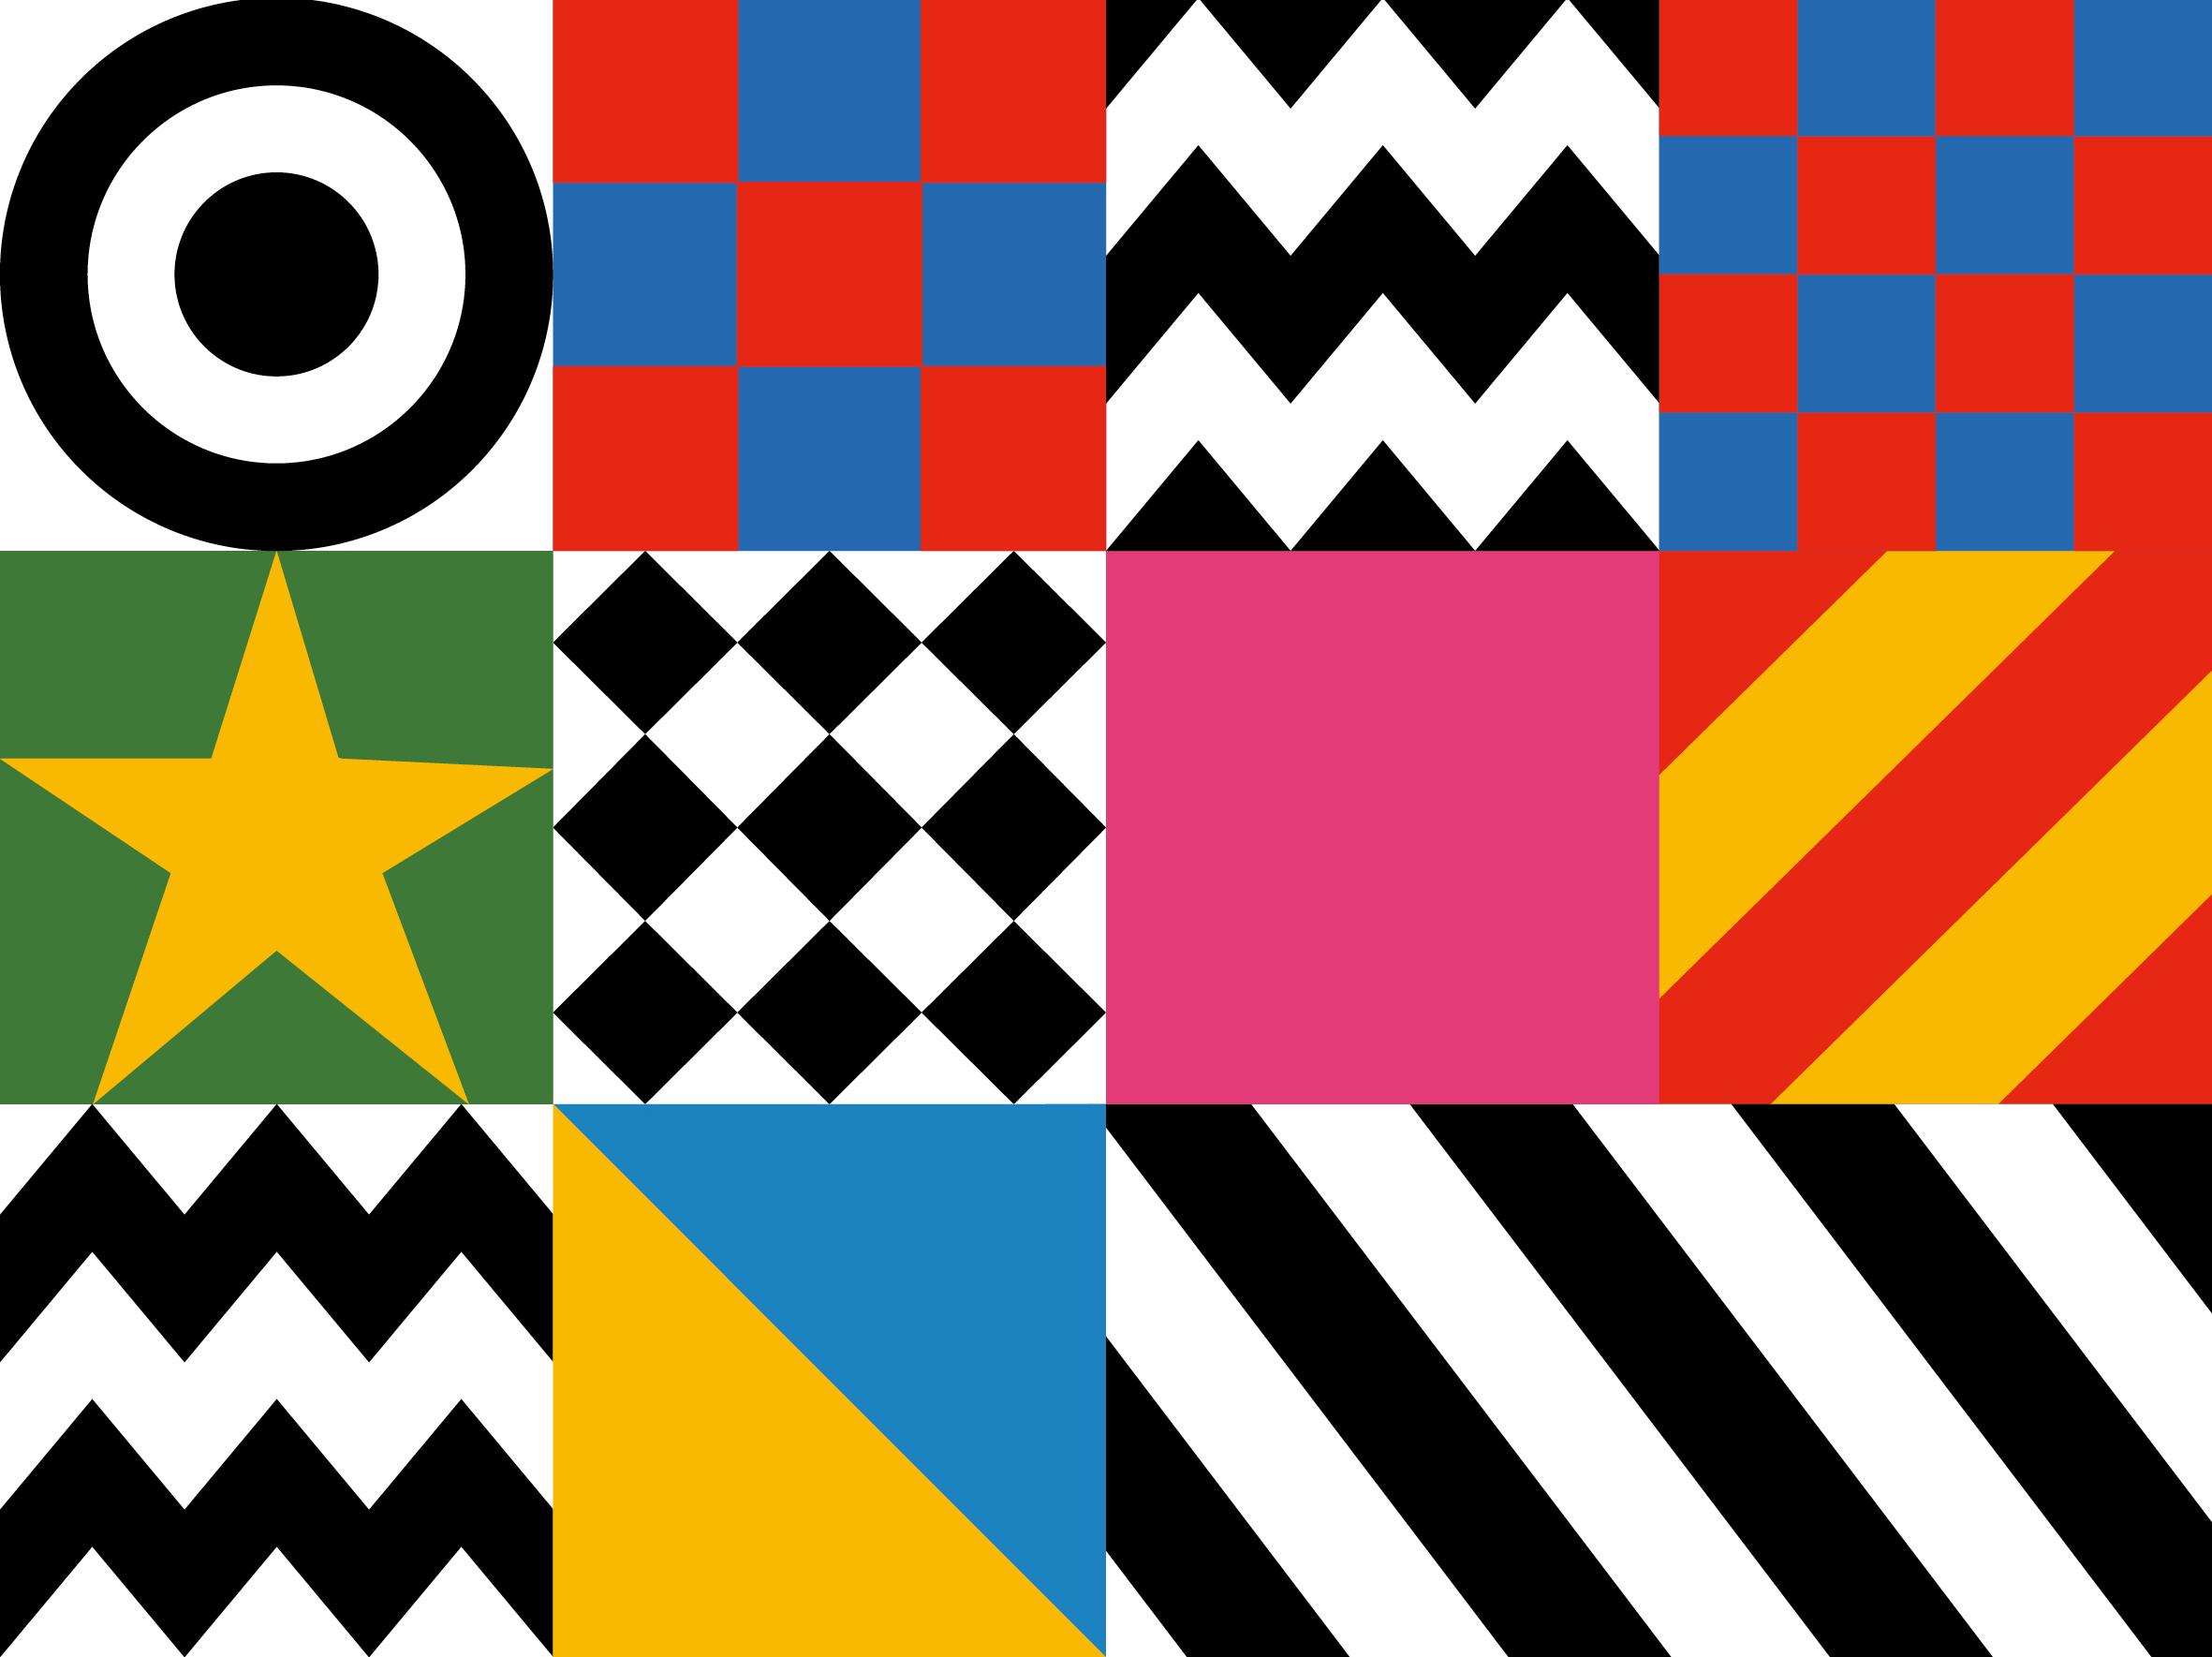 Legendary pop artist Sir Peter Blake adds Razzle Dazzle to the ...